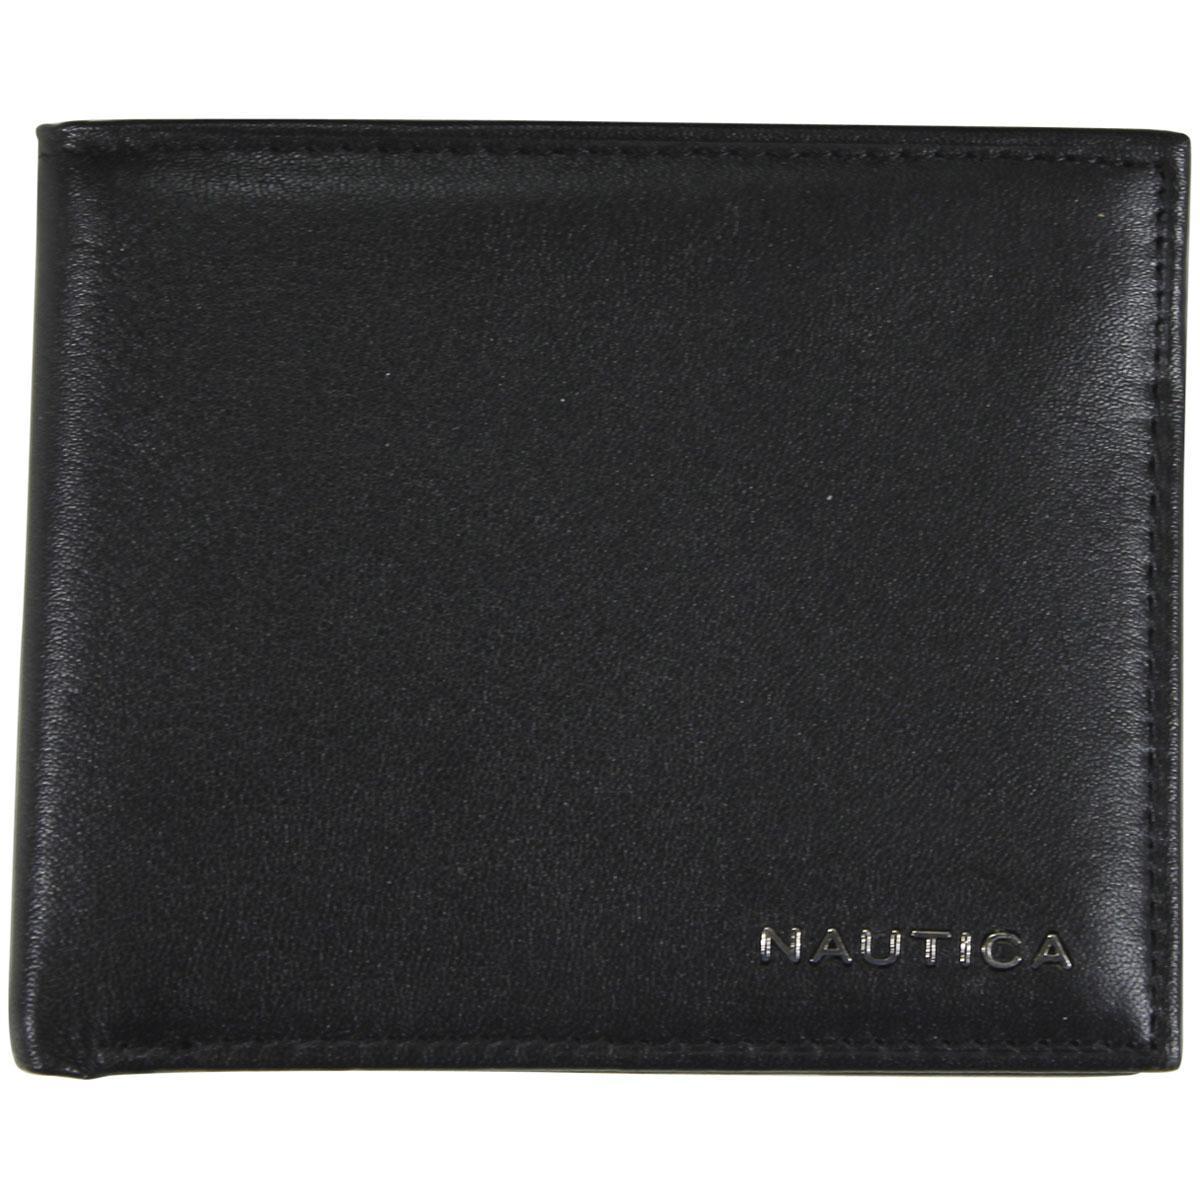 Nautica Men's Weatherly Genuine Leather Passcase Bi-Fold Wallet